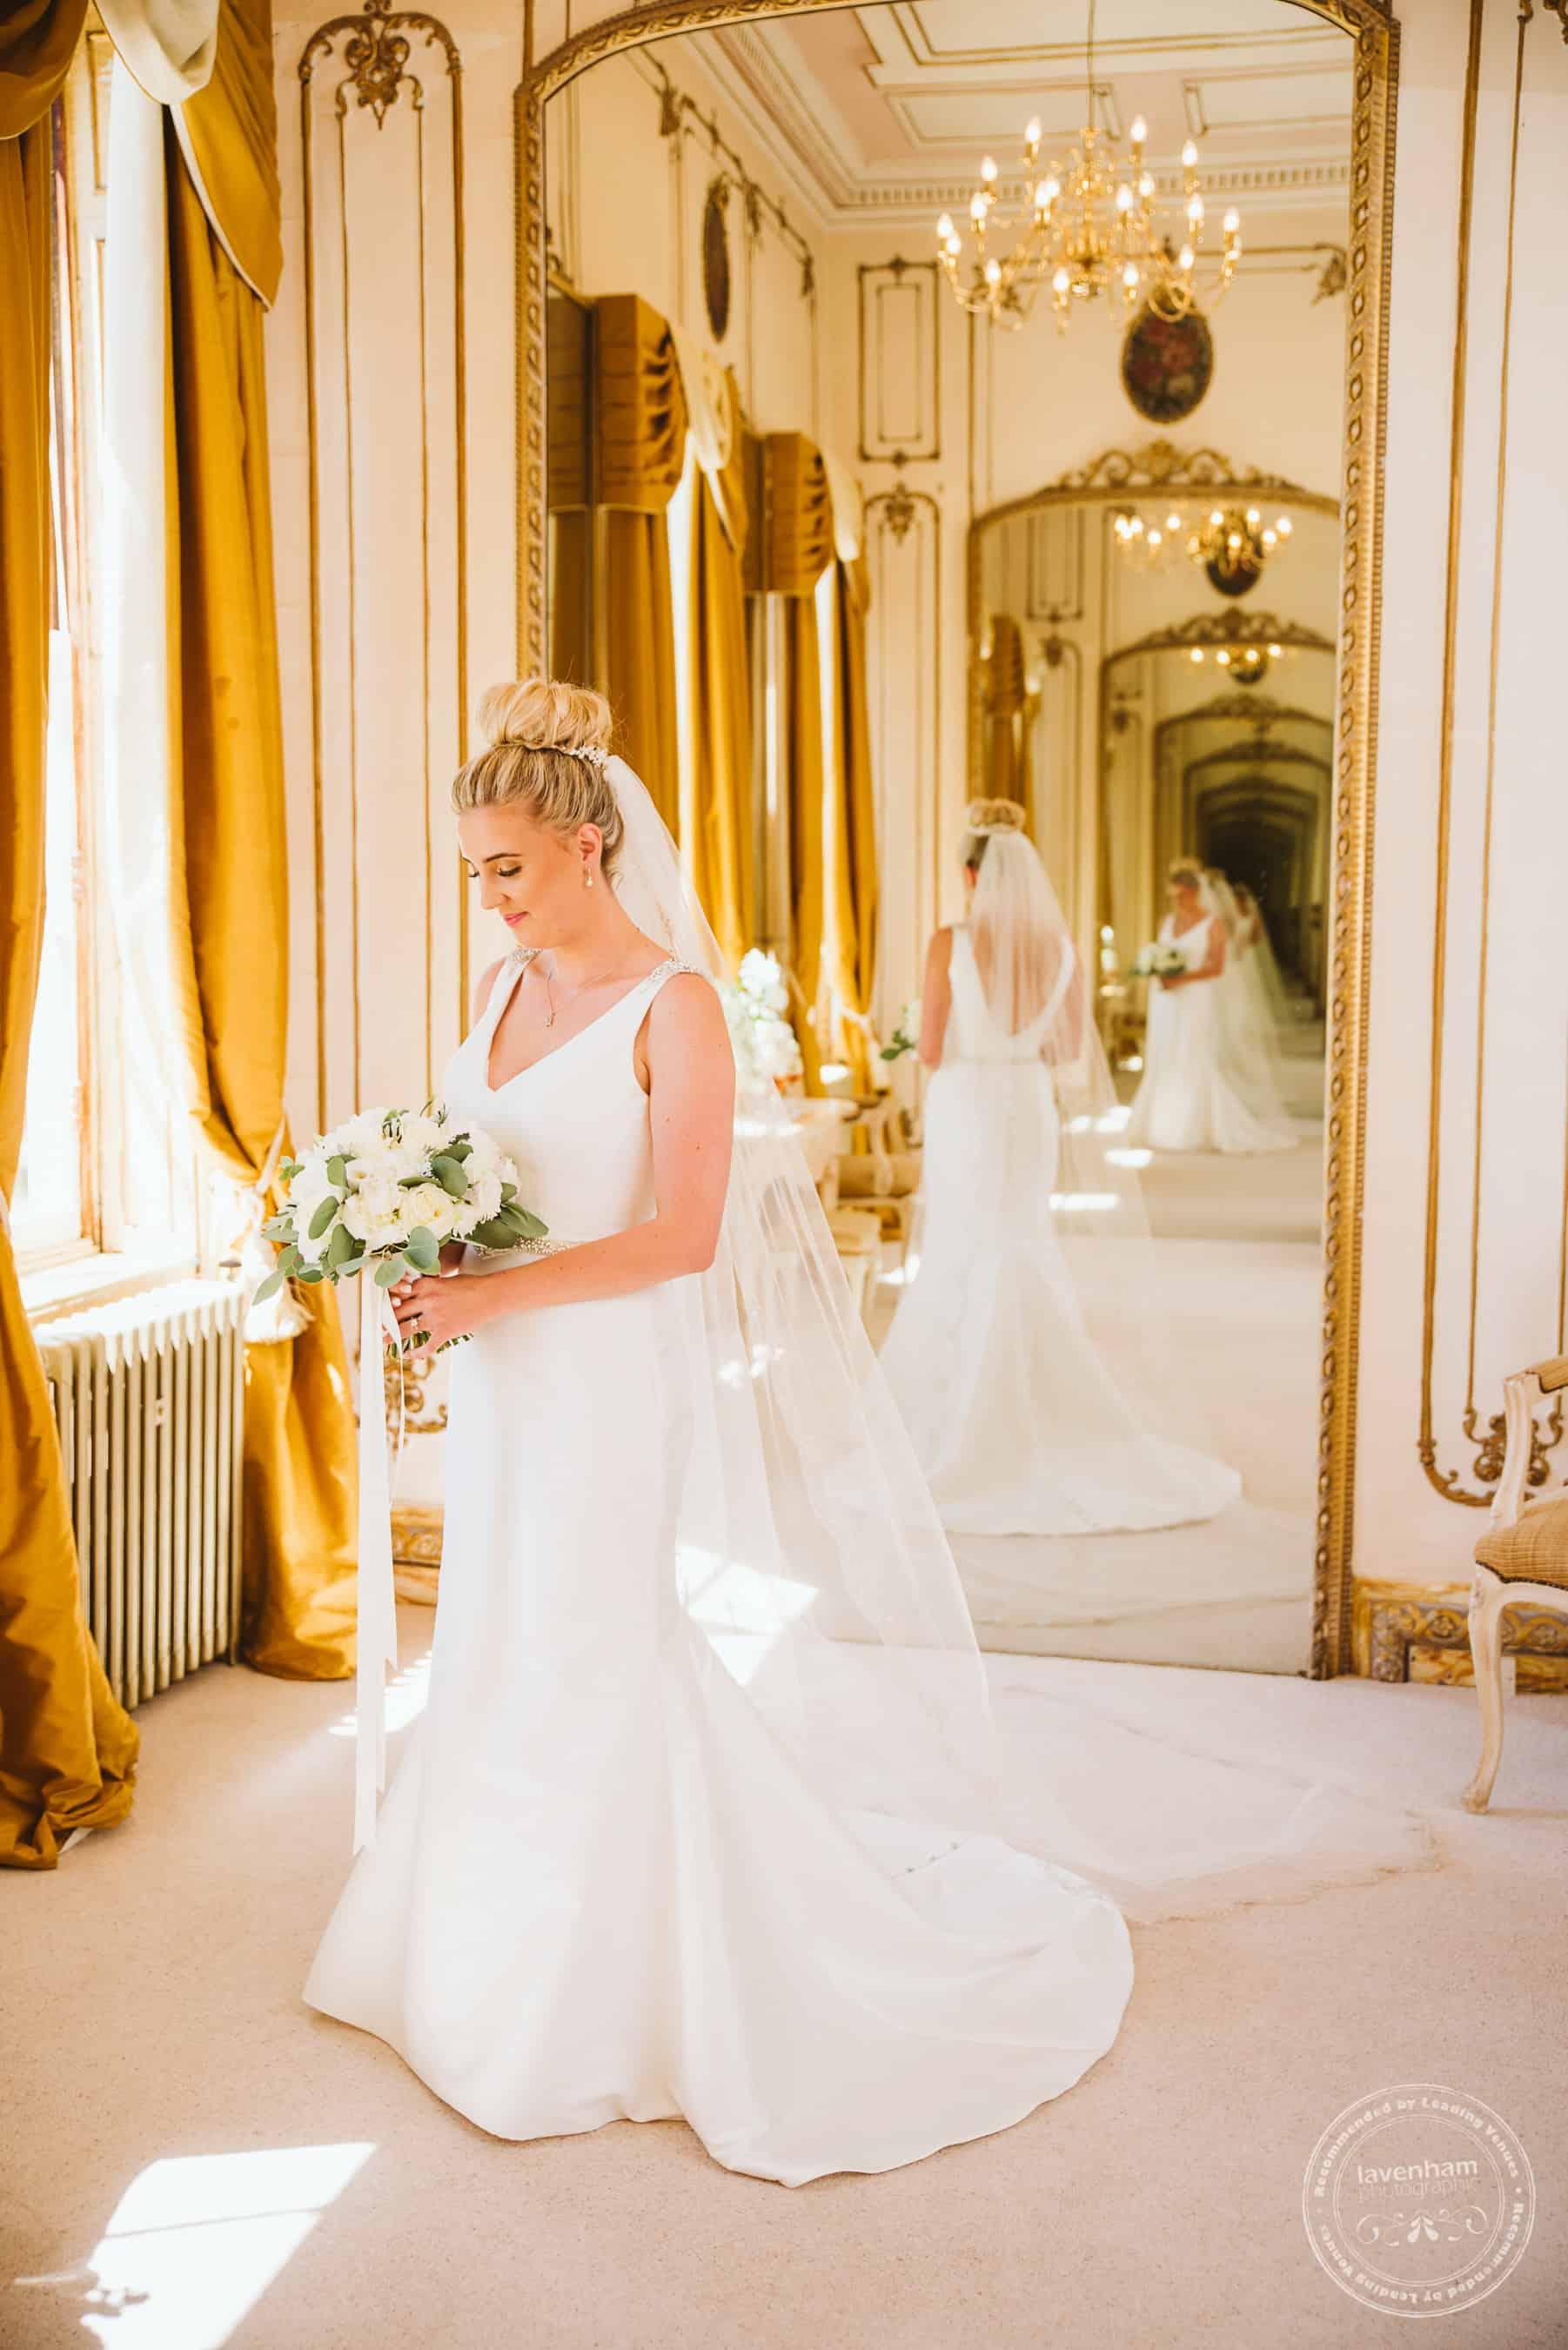 220618 Gosfield Hall Wedding Photography Lavenham Photographic 0044